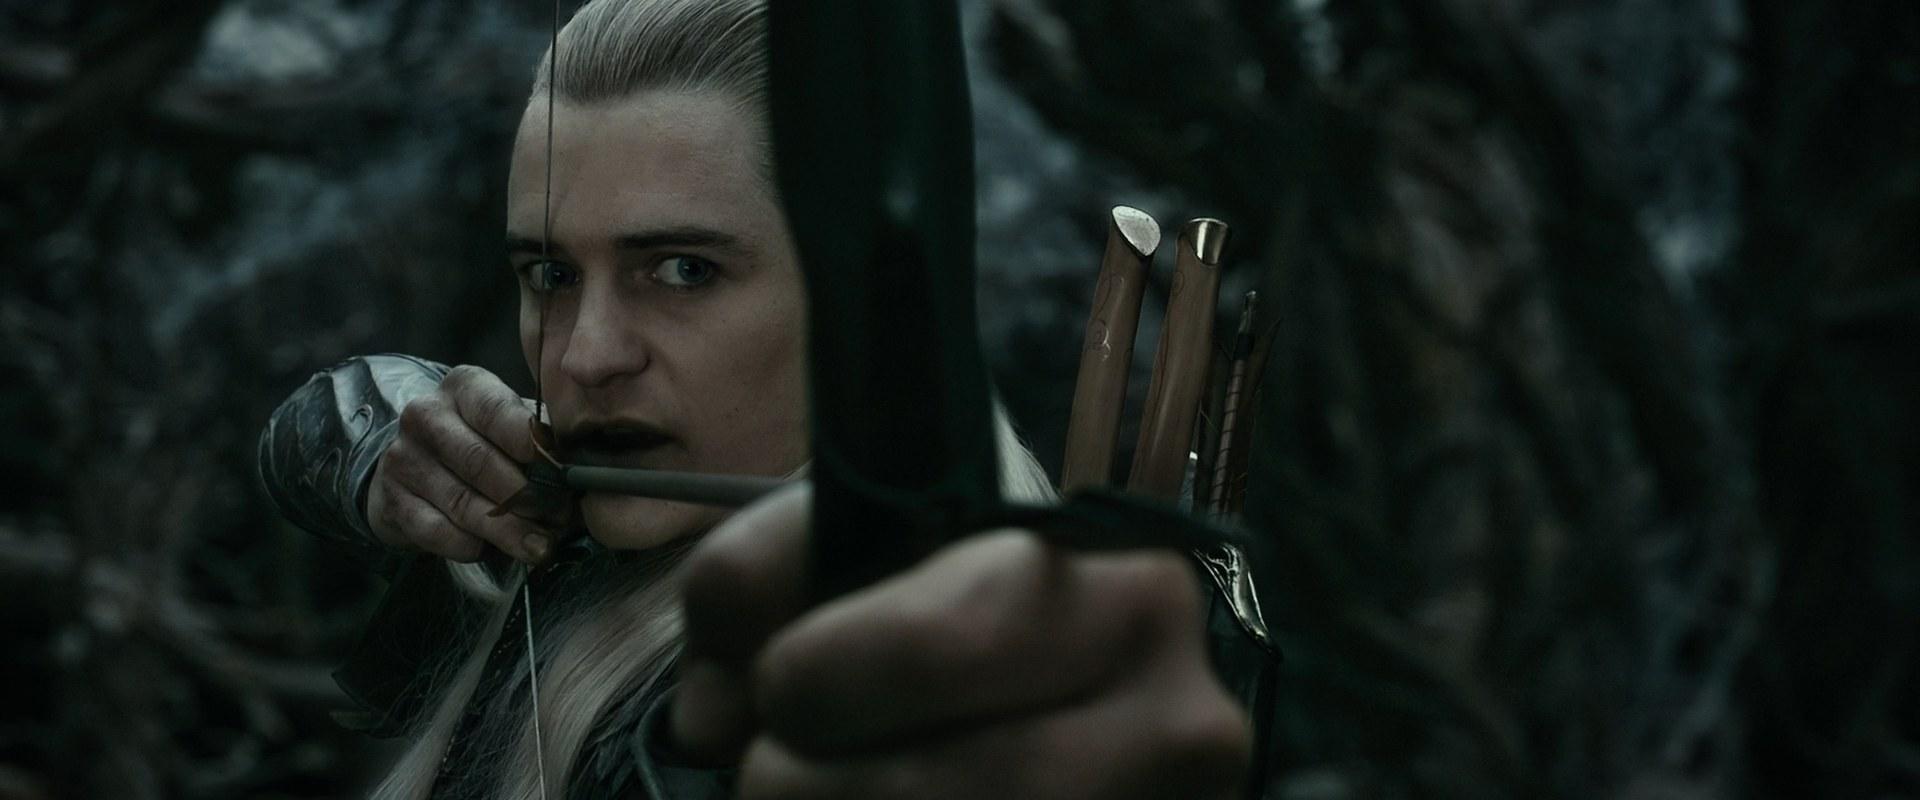 Orlando Bloom som Legolas, skjuter pilbåge